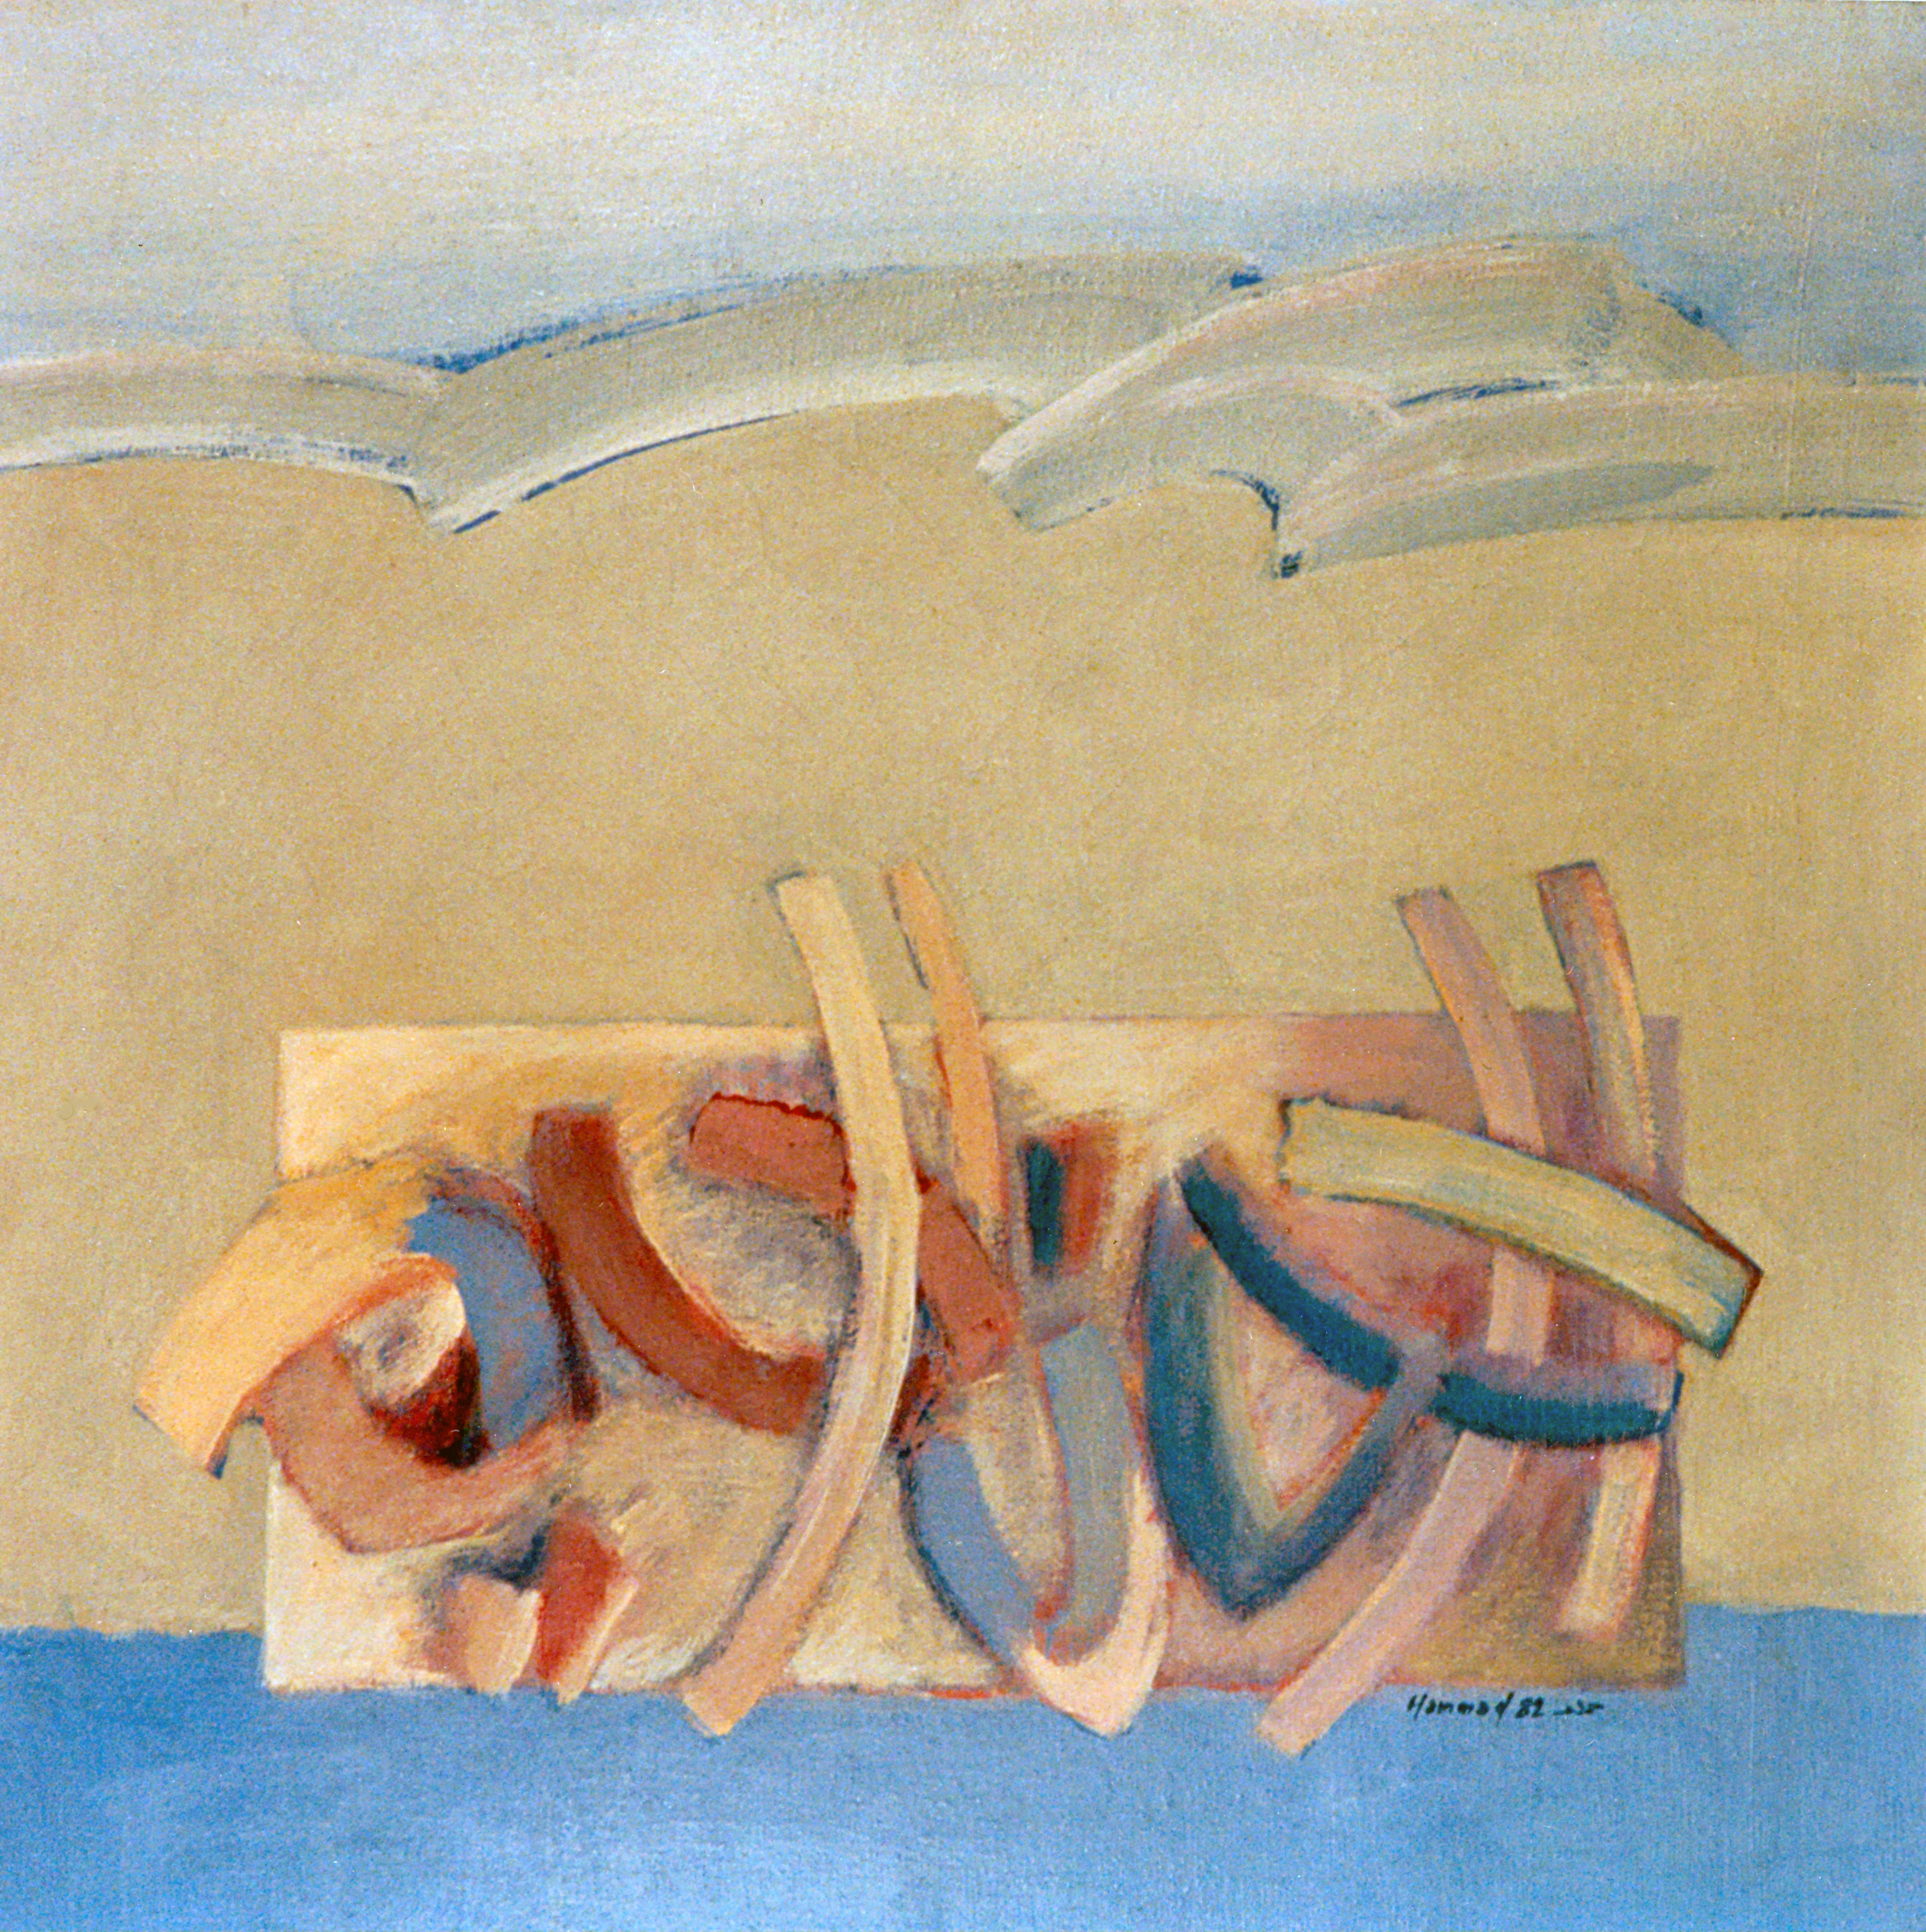 Calligraphy . Alrahman Alraheem . 1982 . الرحمن الرحيم